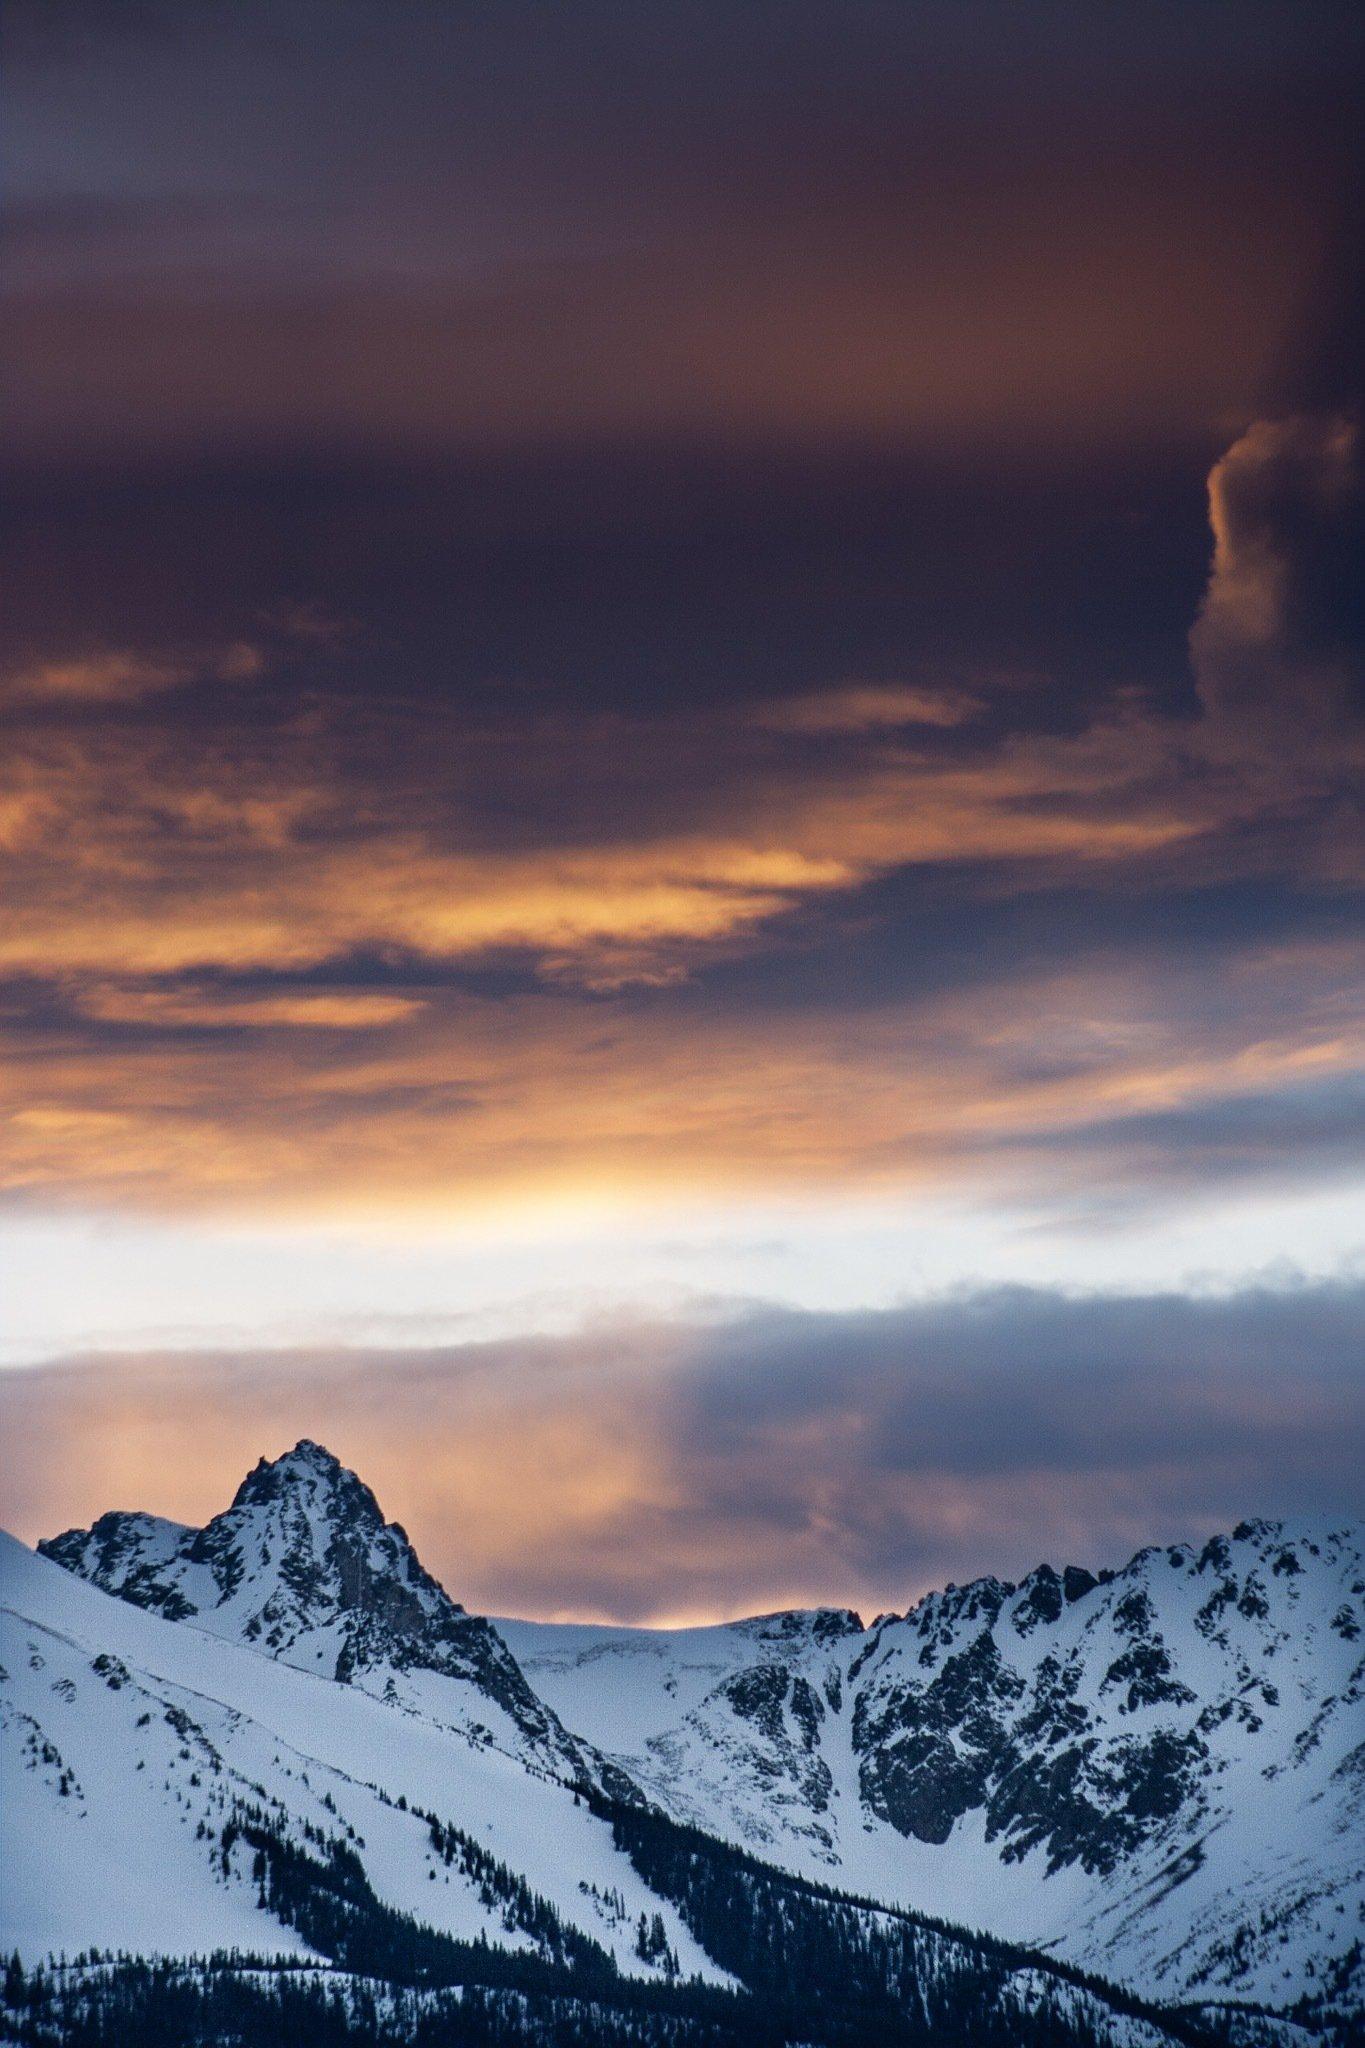 Urple Clouds